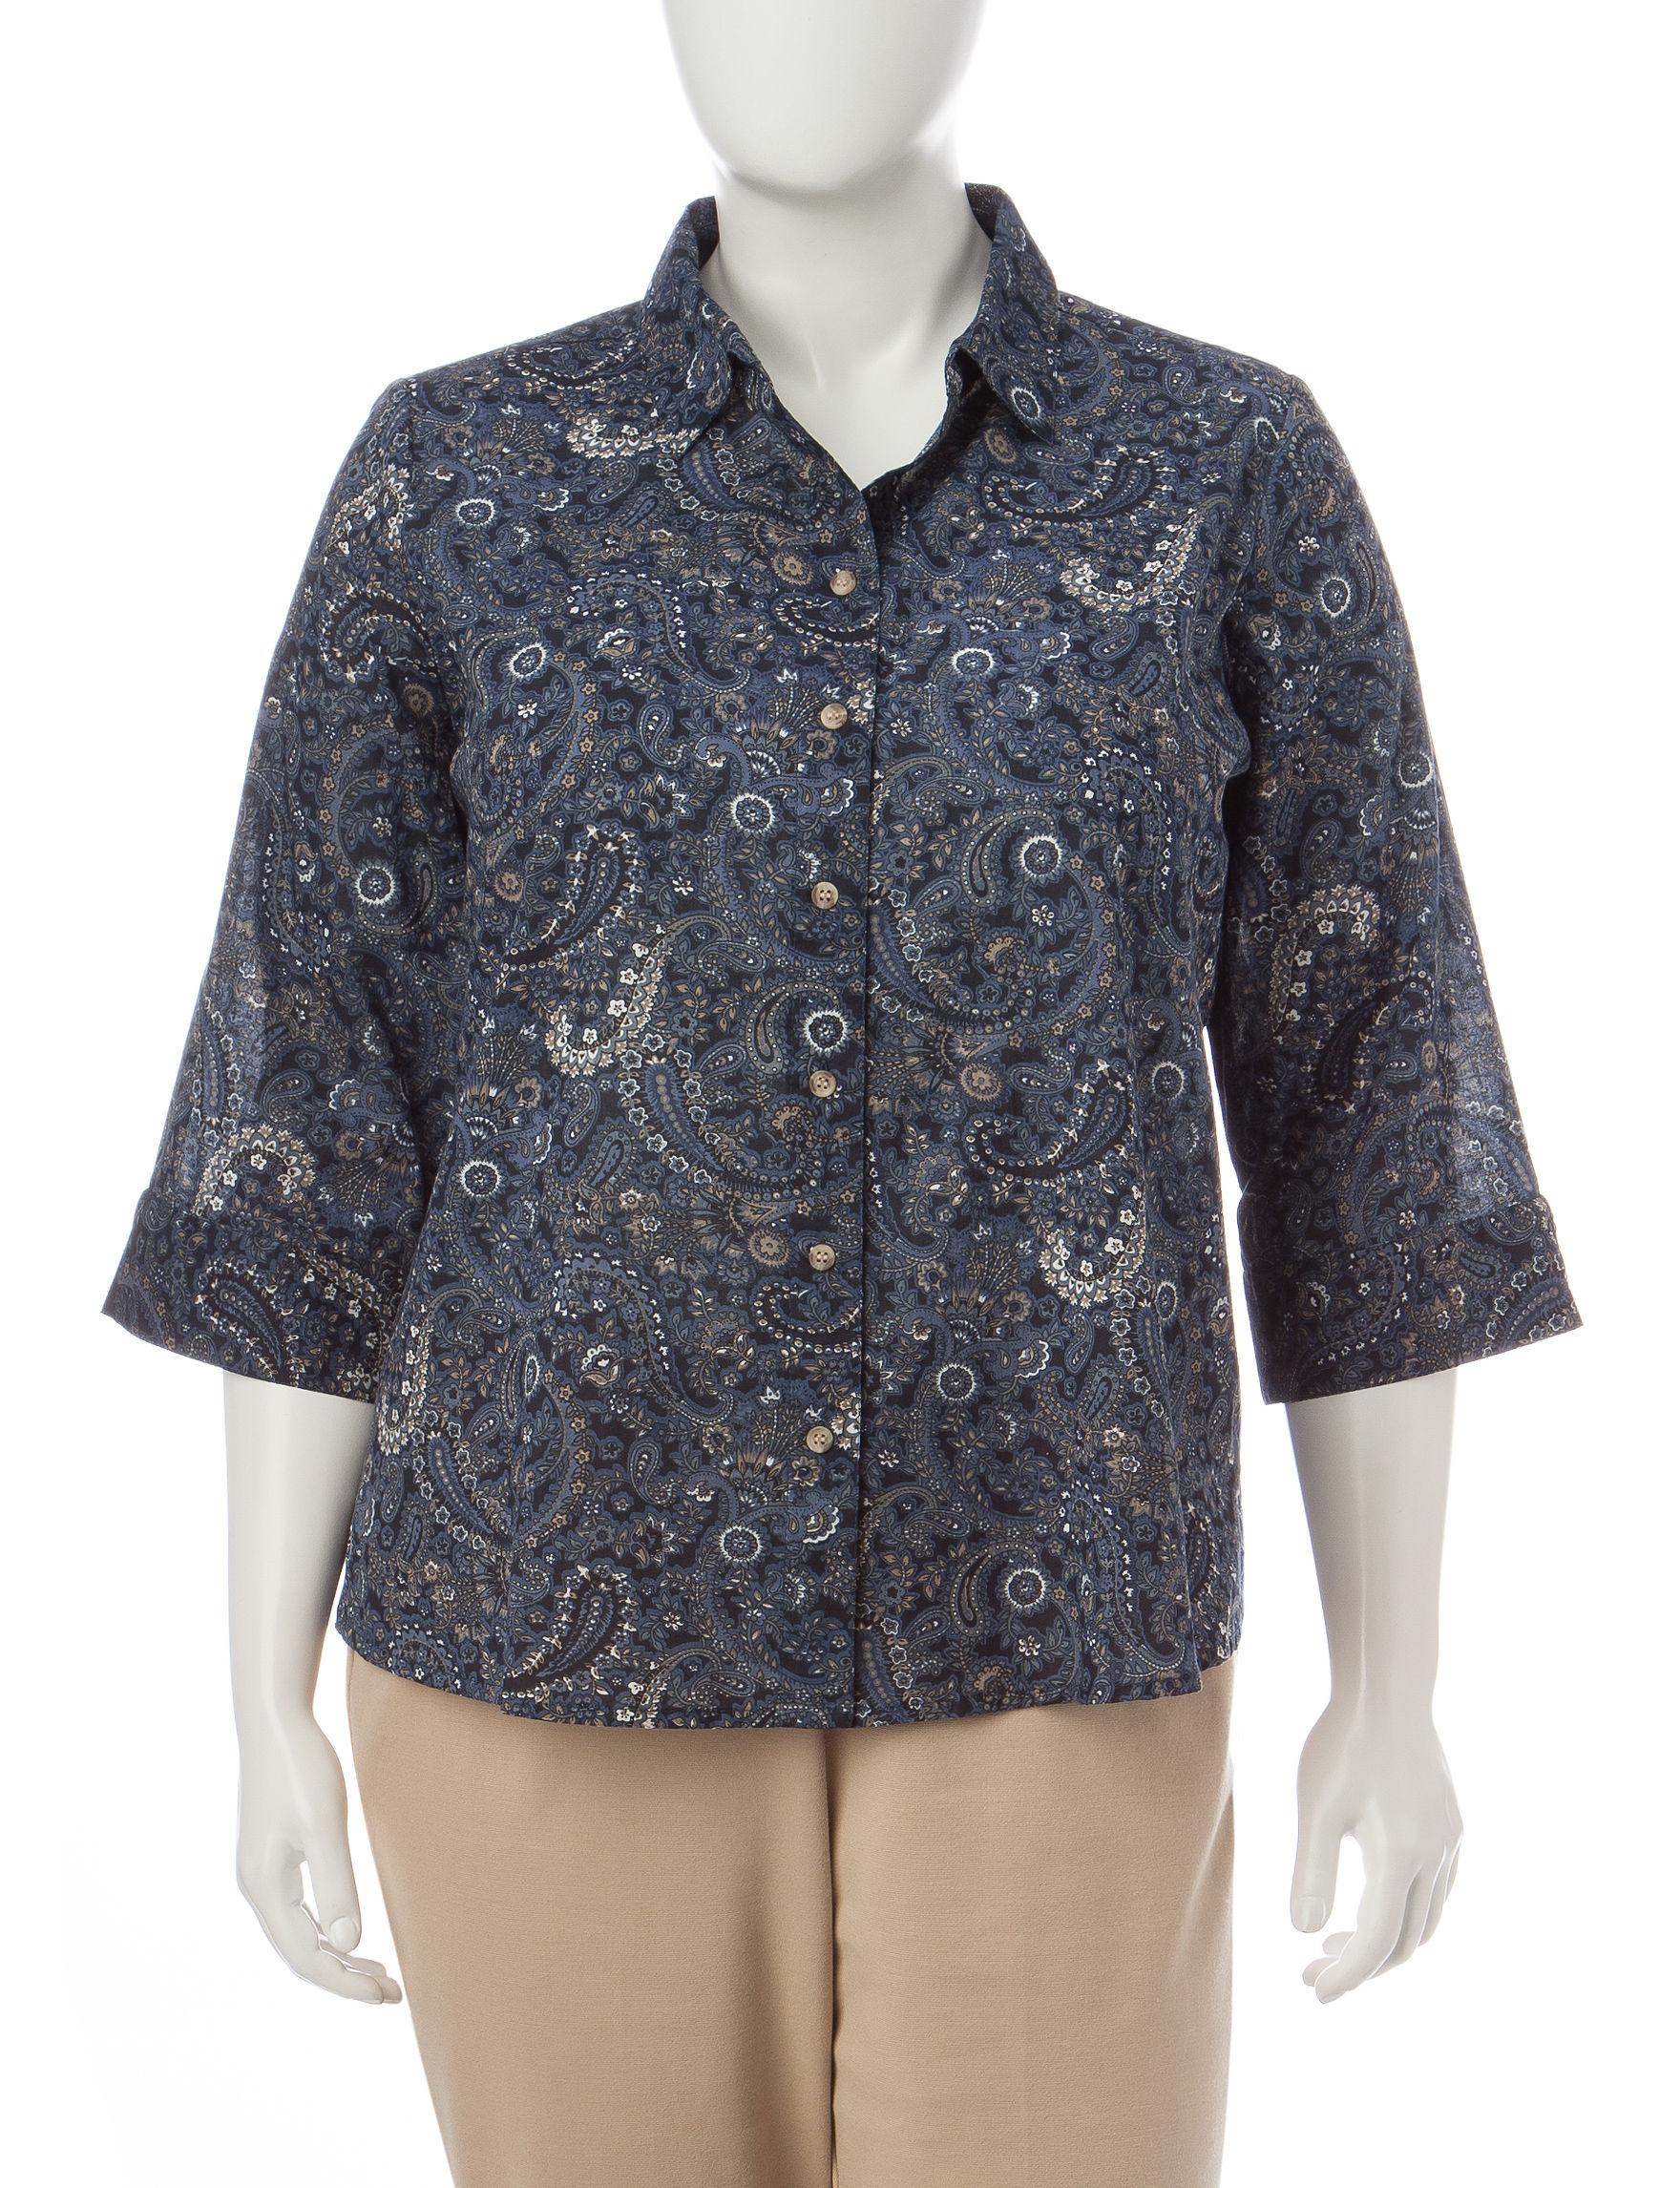 Rebecca Malone Beige / Blue Shirts & Blouses